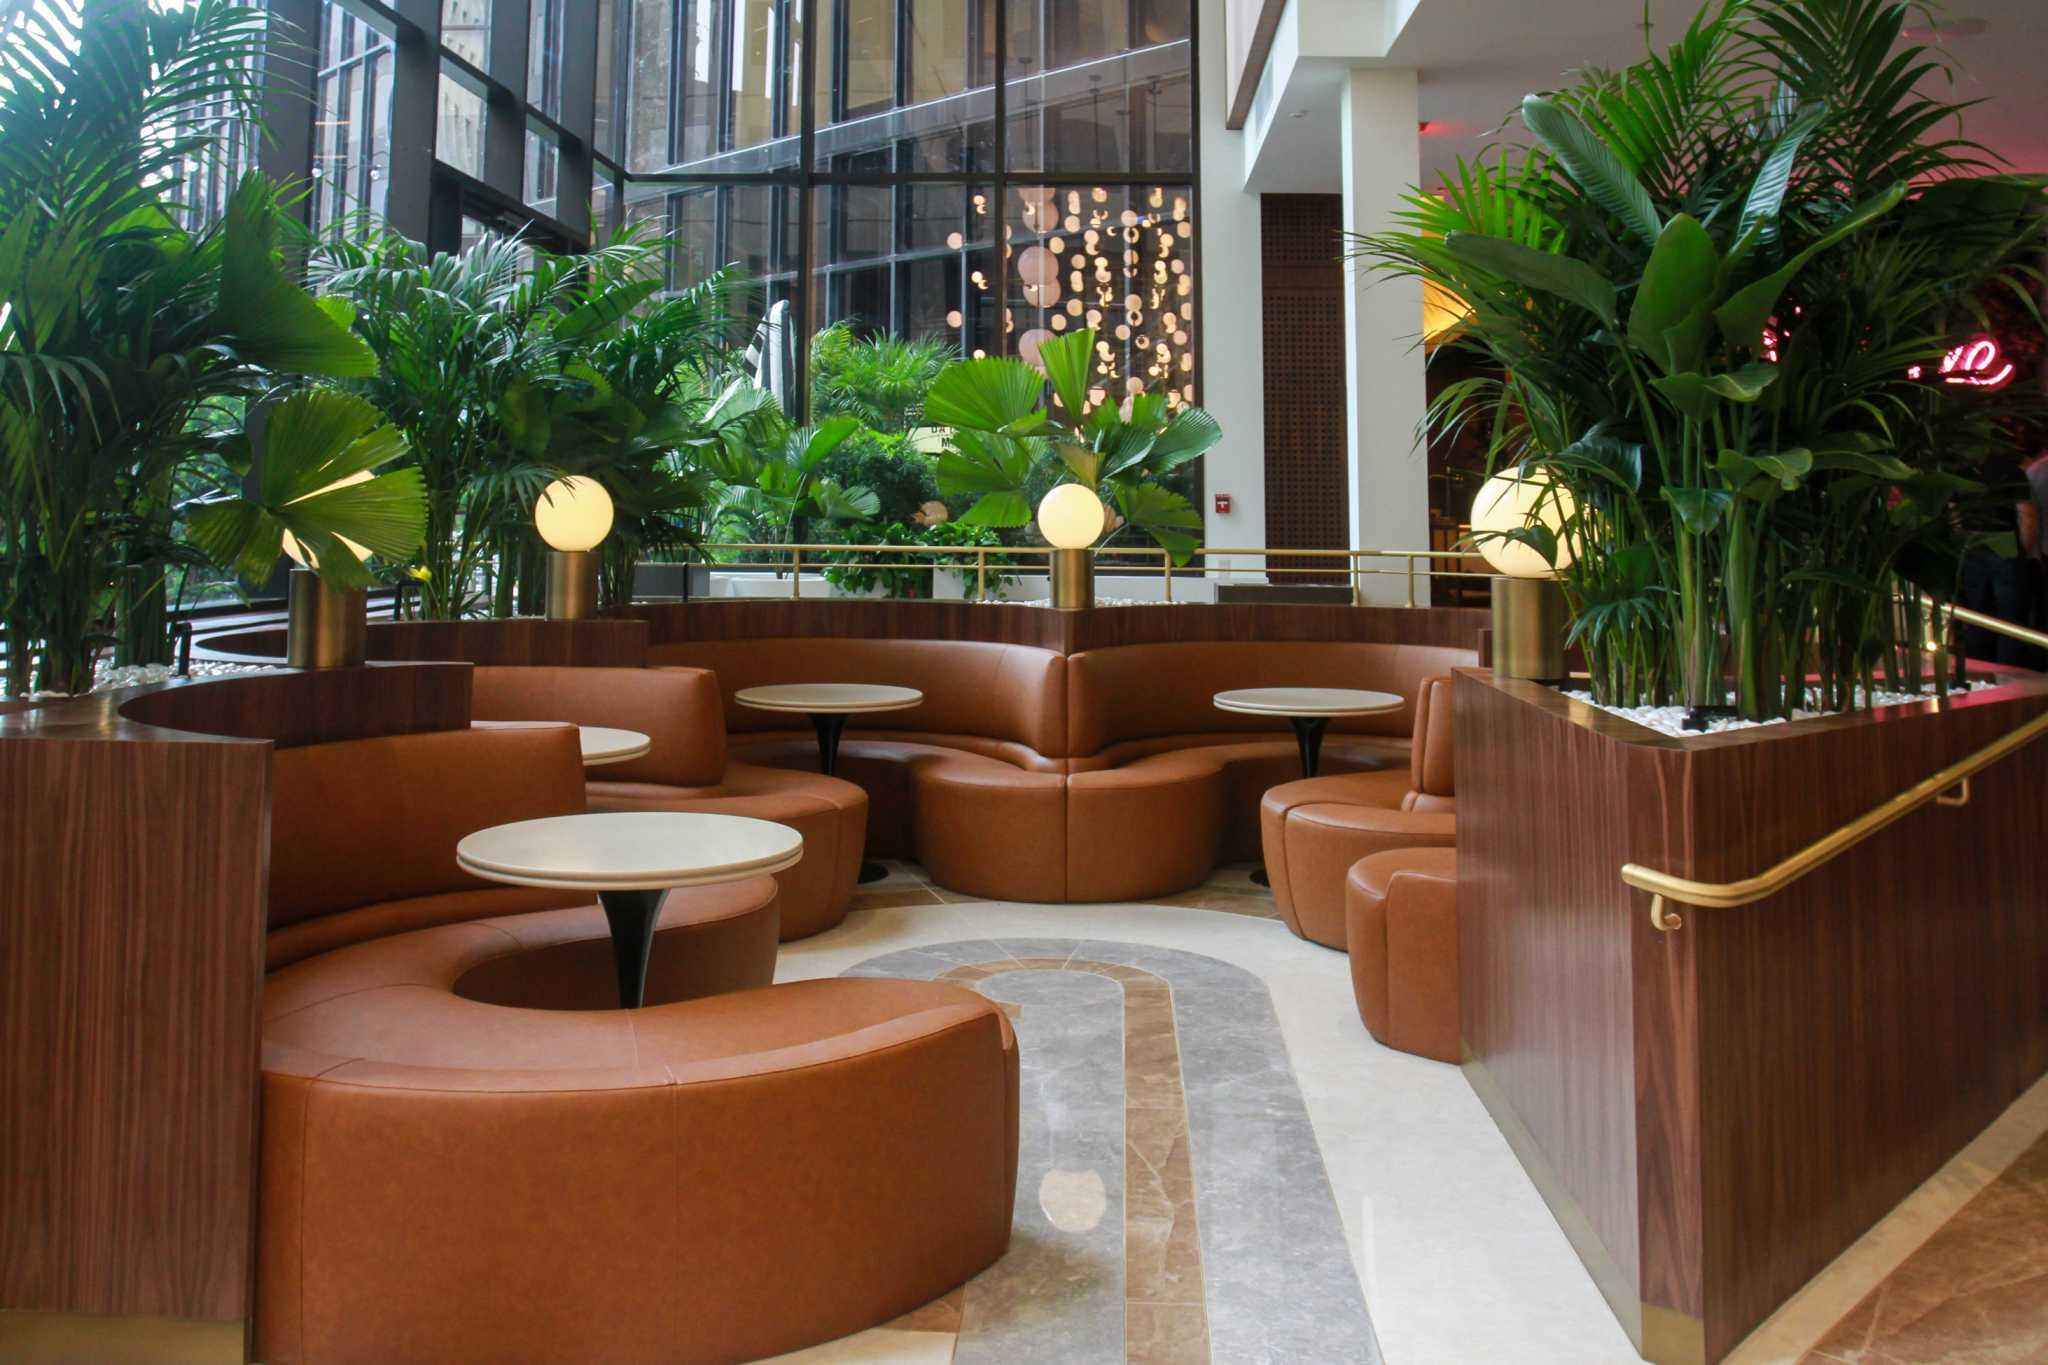 See inside downtown Houston's new multi-million C. Baldwin hotel